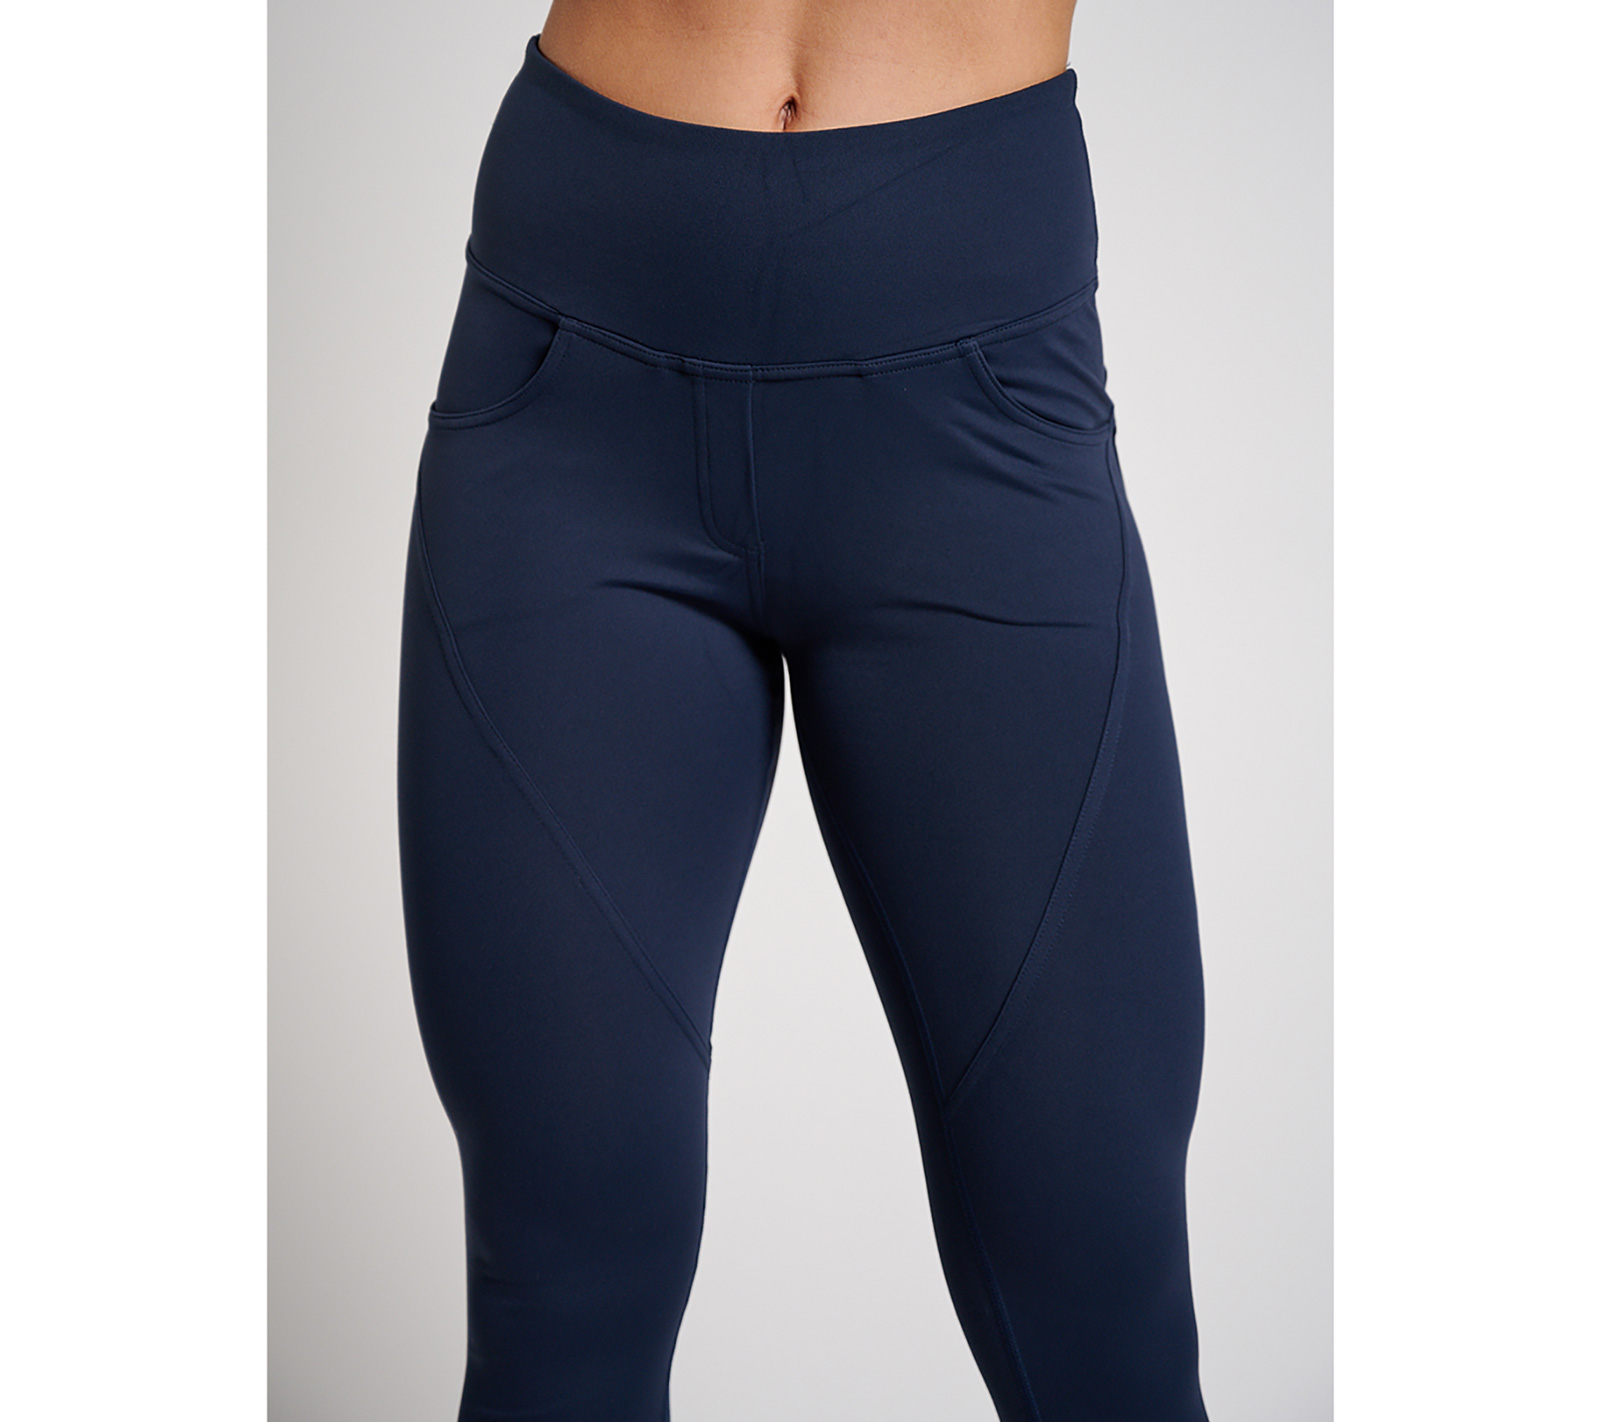 Fitnesslegging Dames High Waist Tight Donkerblauw XXL Sportswear Tight High Waist Legging